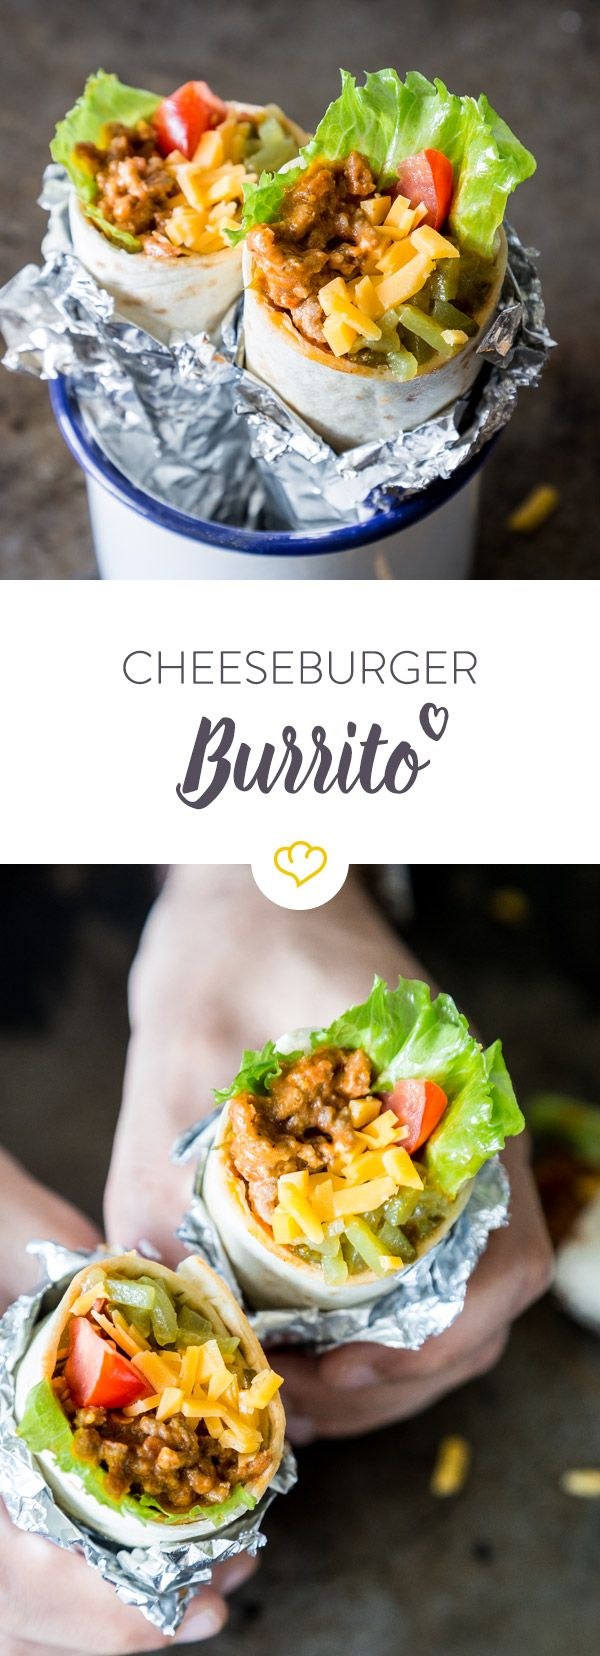 Cheeseburger Burrito #tacodip